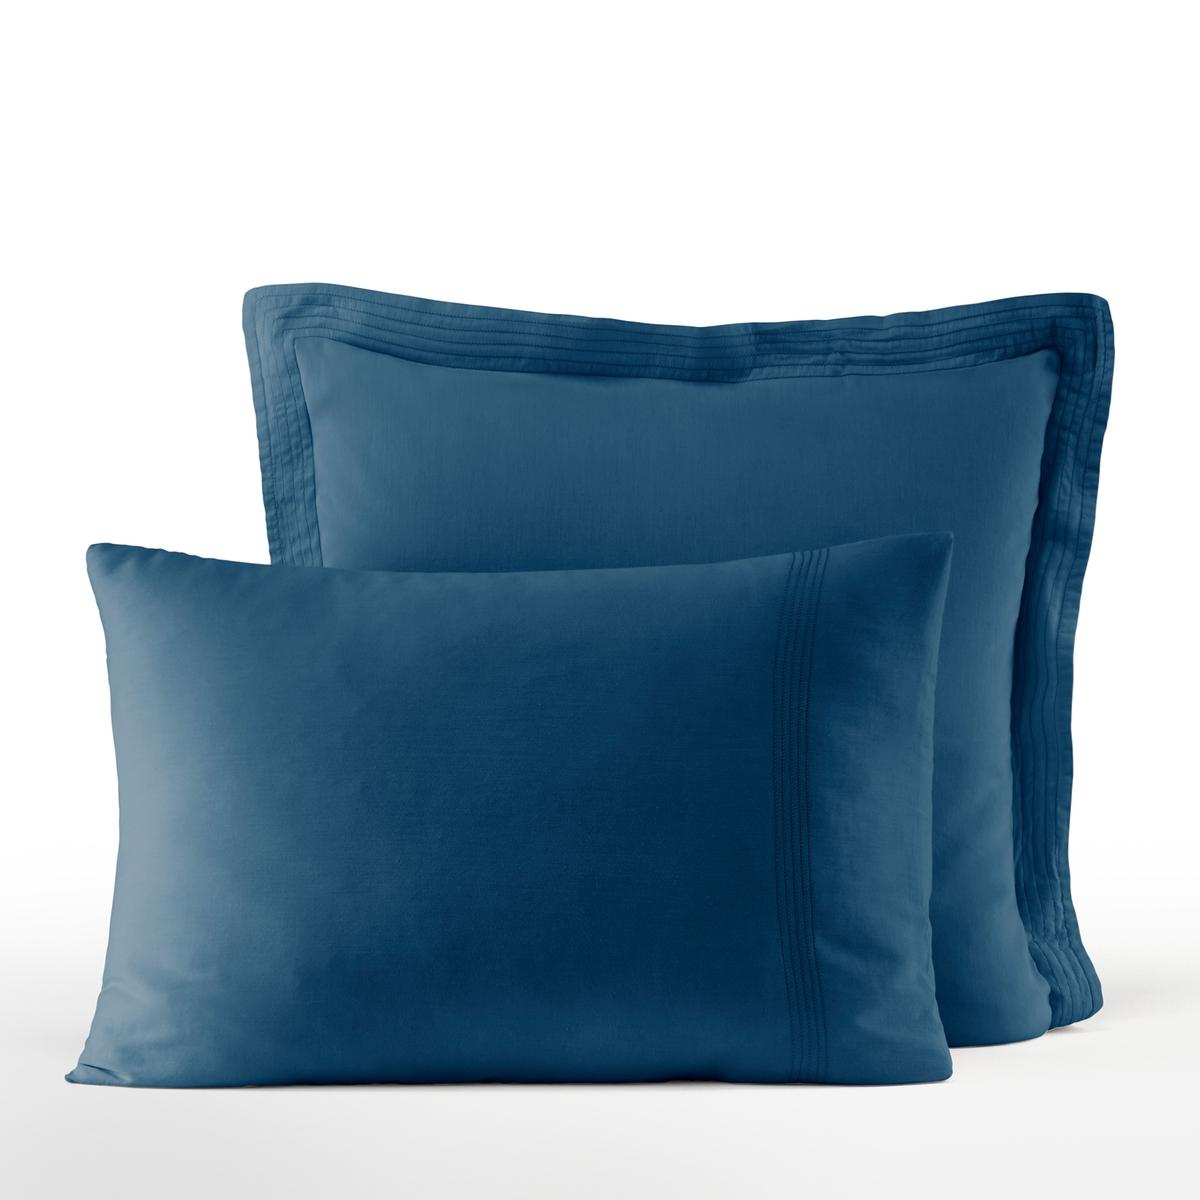 Наволочка La Redoute Из хлопкового сатина Bermidi 50 x 70 см синий наволочка la redoute flooch 50 x 30 см бежевый